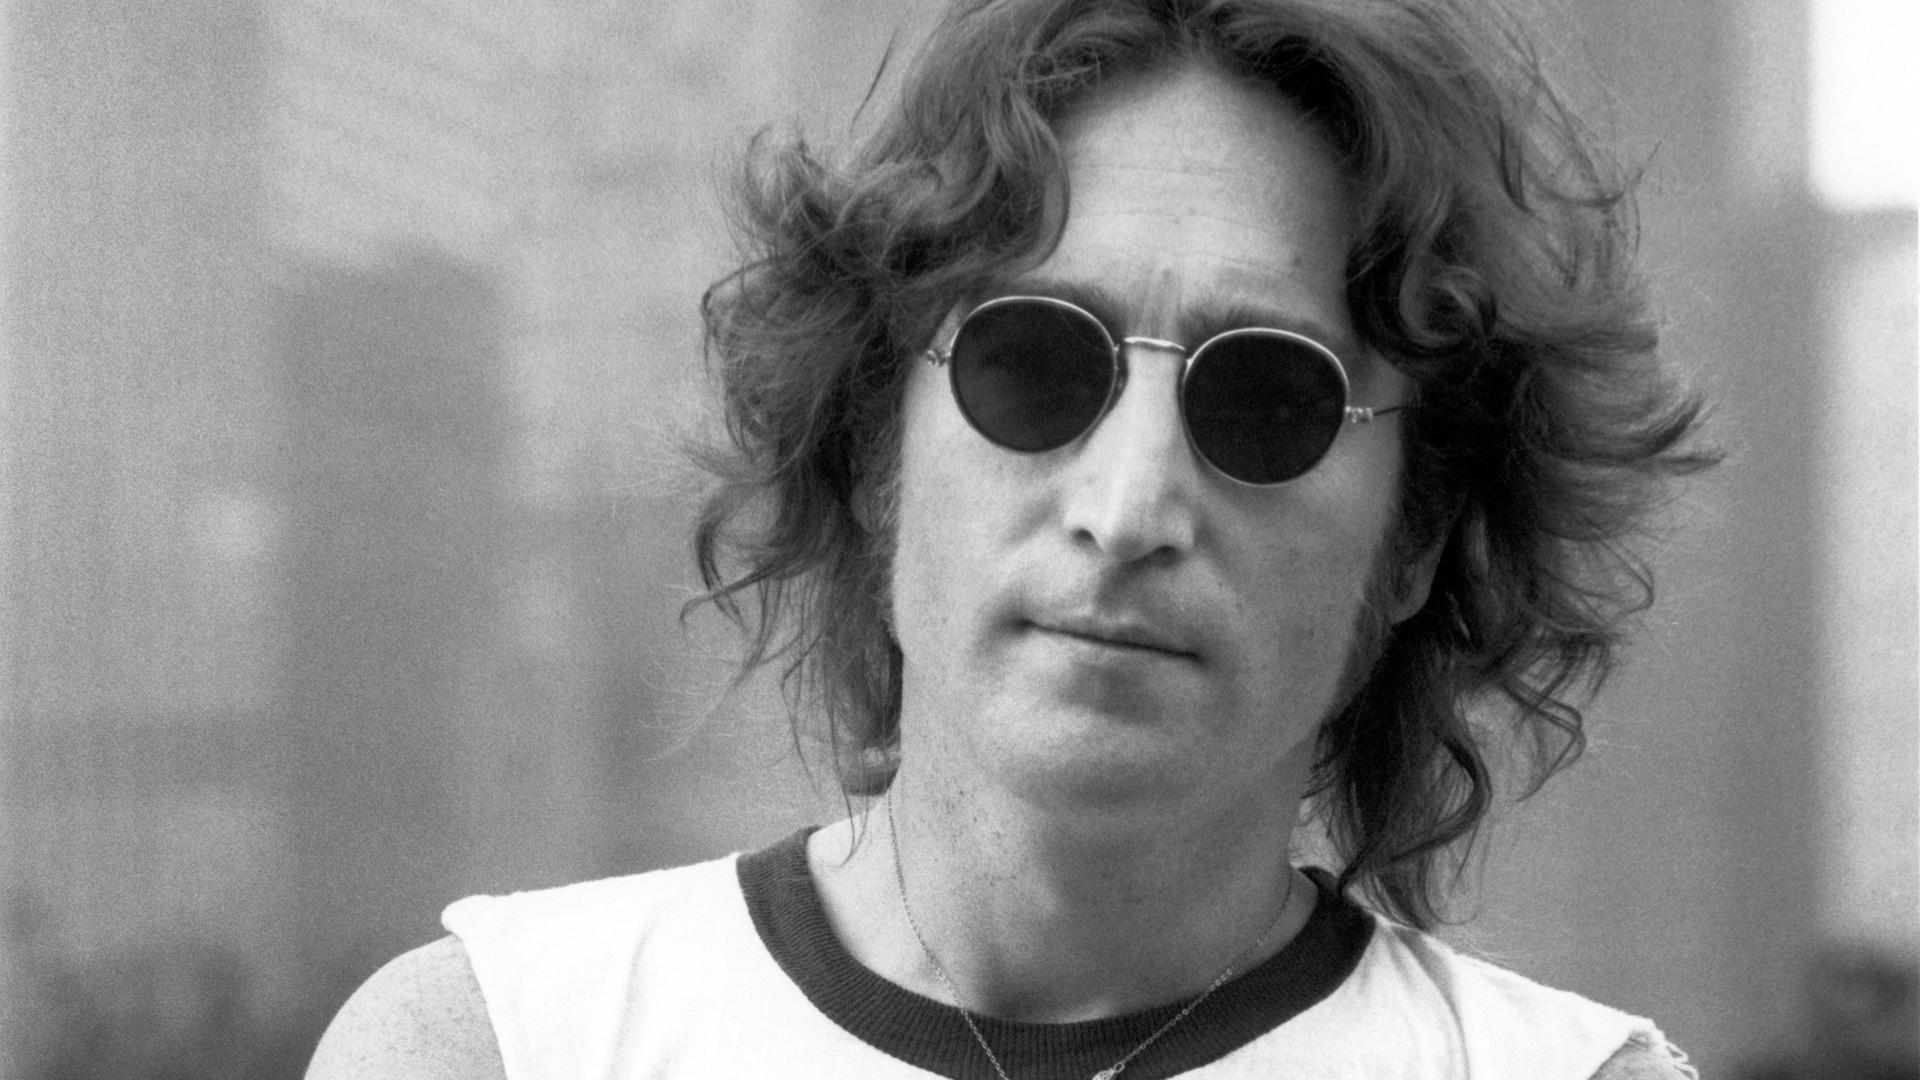 Pittsburgh had its own John Lennon stalker -- only she left a love letter.